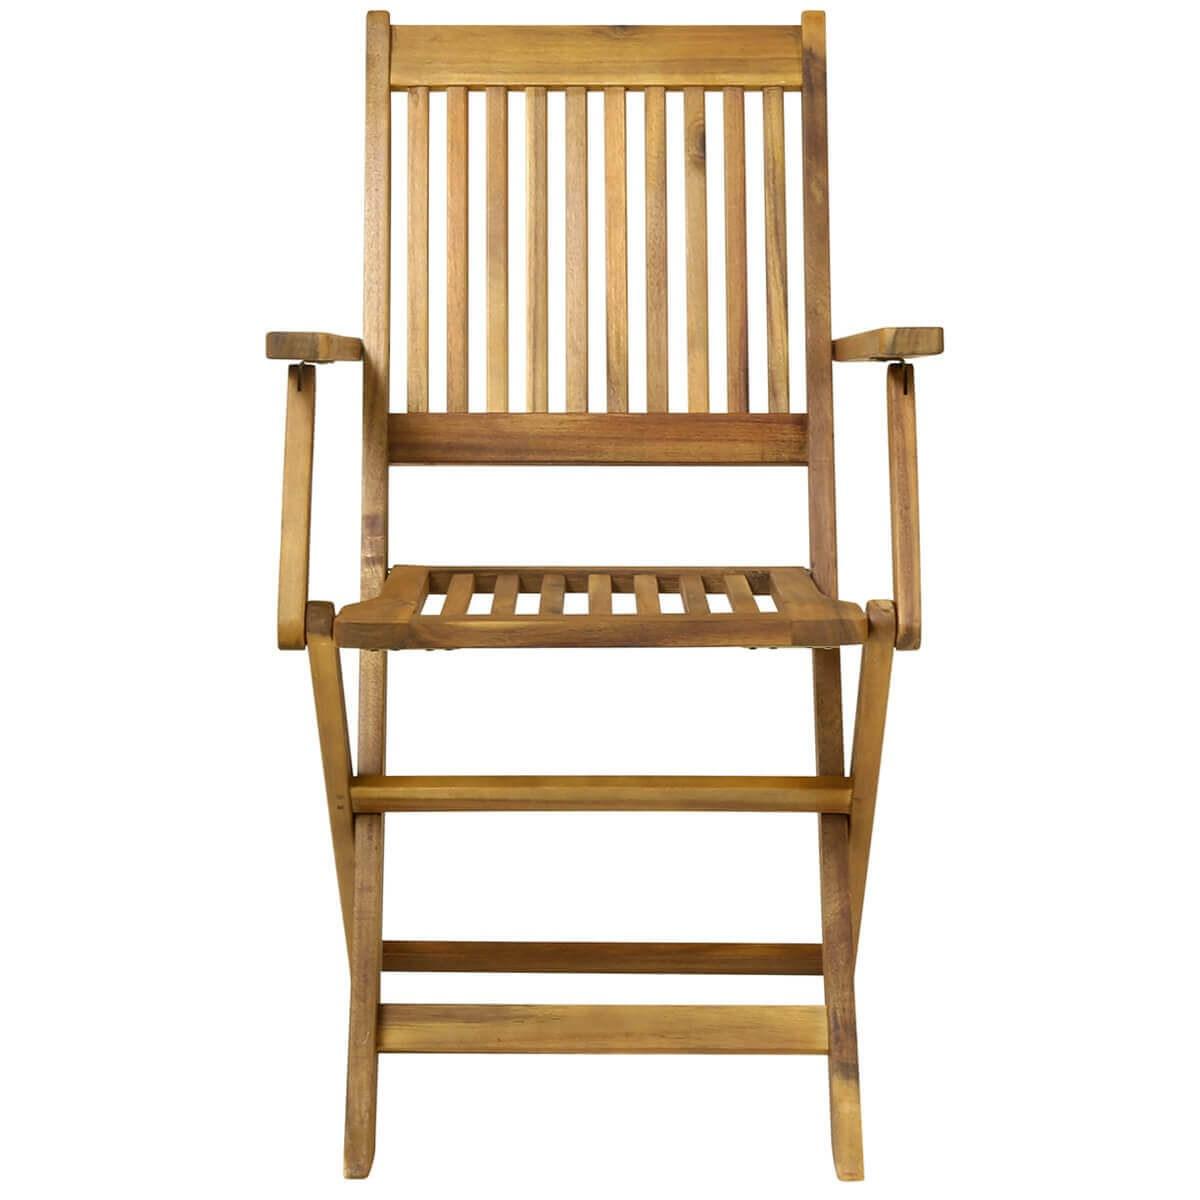 Folding Garden Wooden Arm Chairs Pair - savvysurf.co.uk